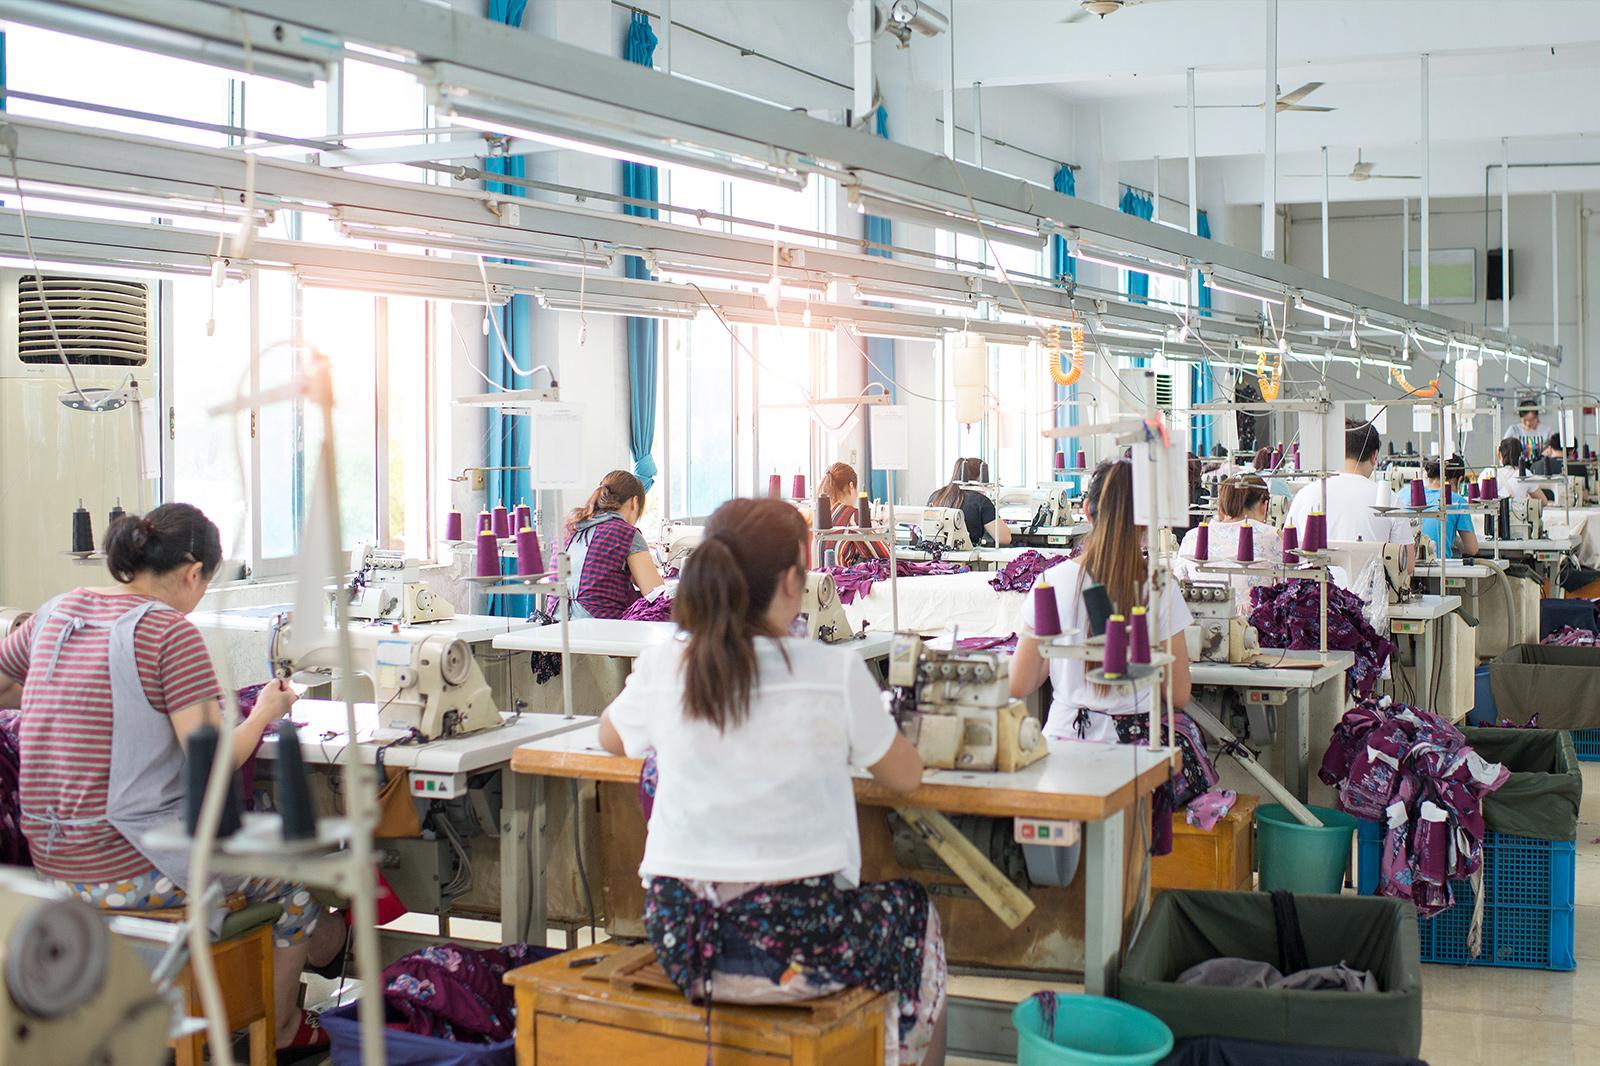 縫製工場の画像